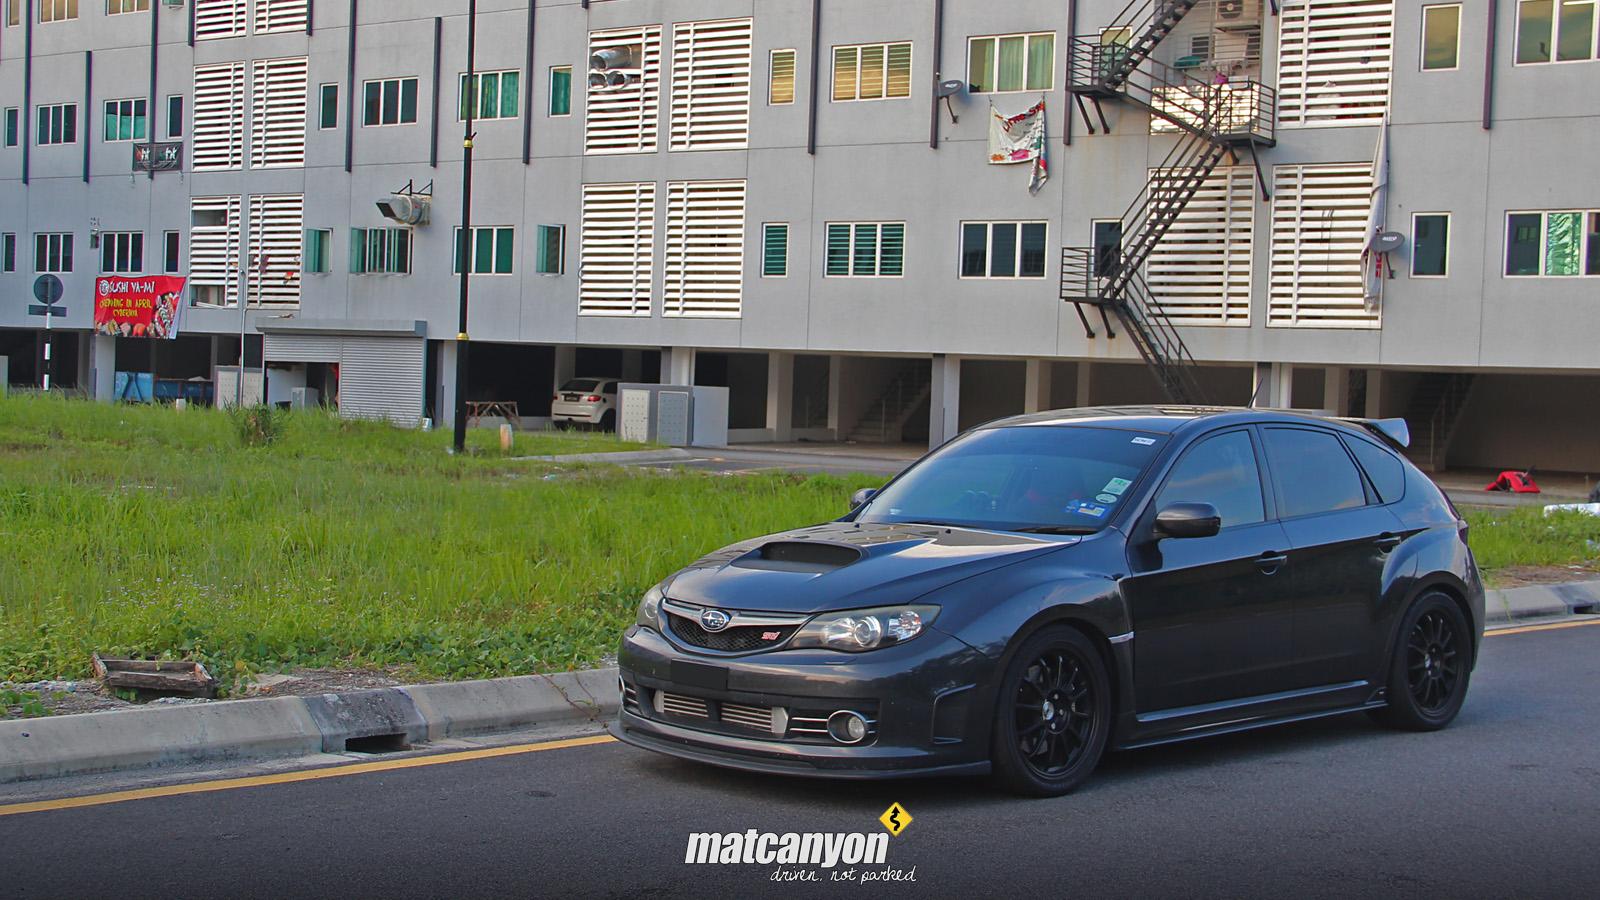 Mat Canyon: Murder Inc | Erwin's All Black Subaru WRX STI